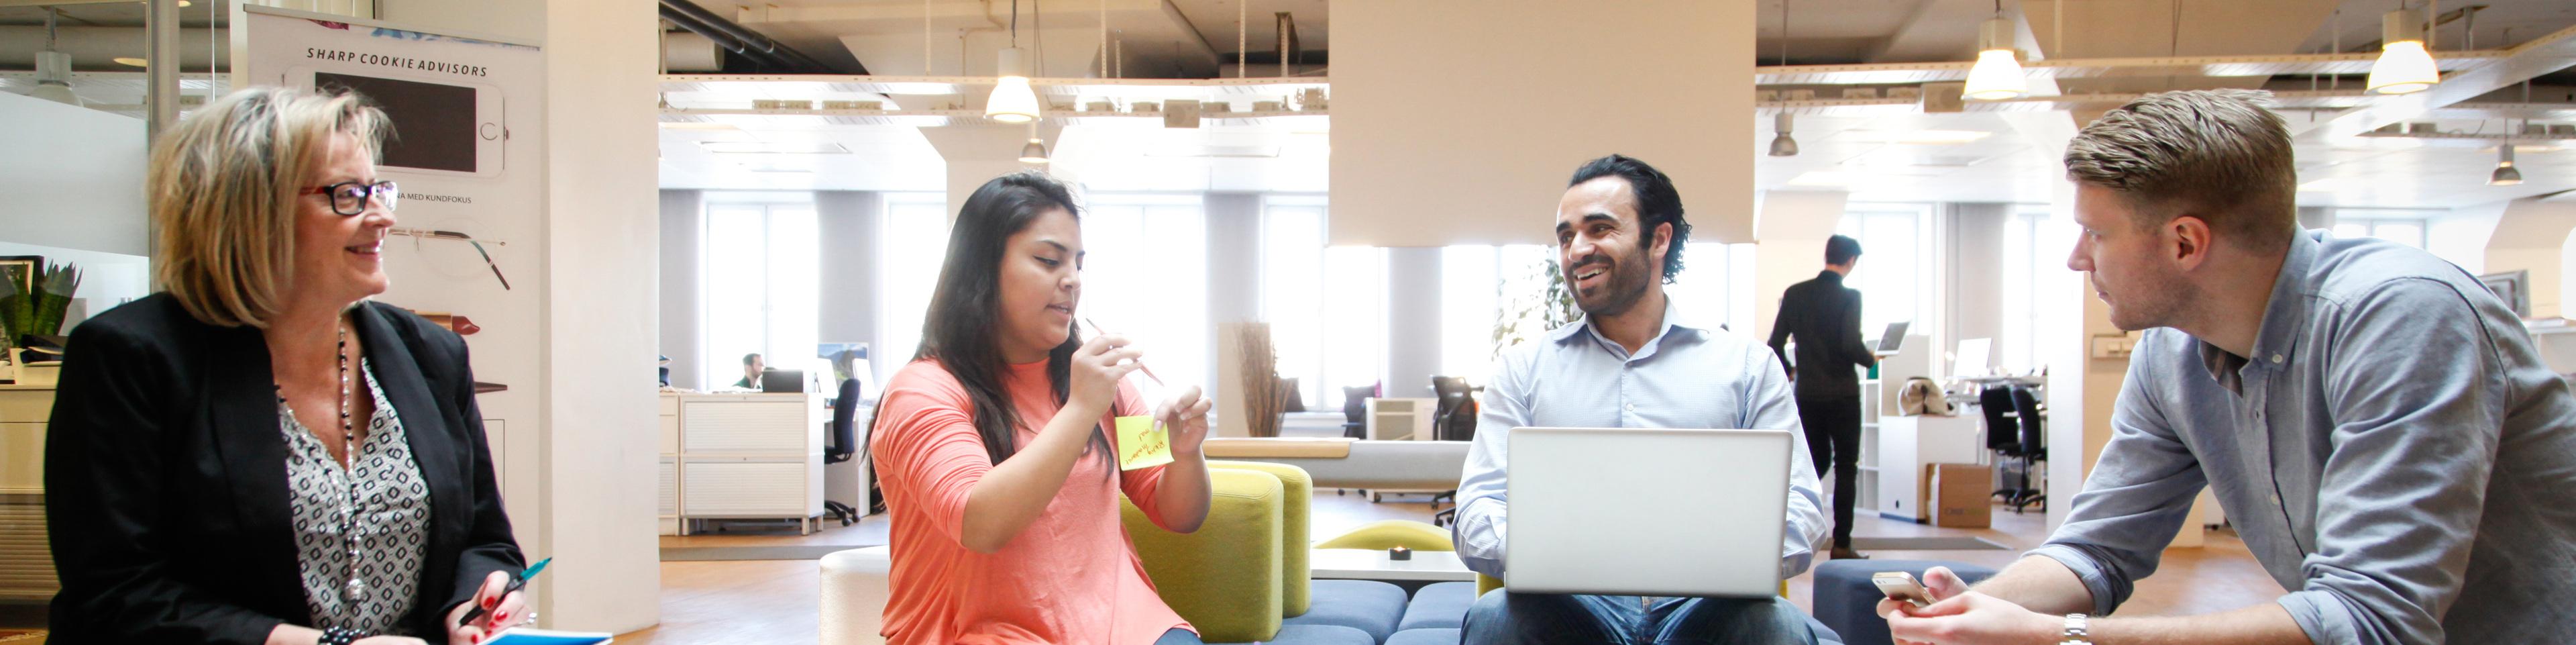 Samarbete i öppet kontorslandskap